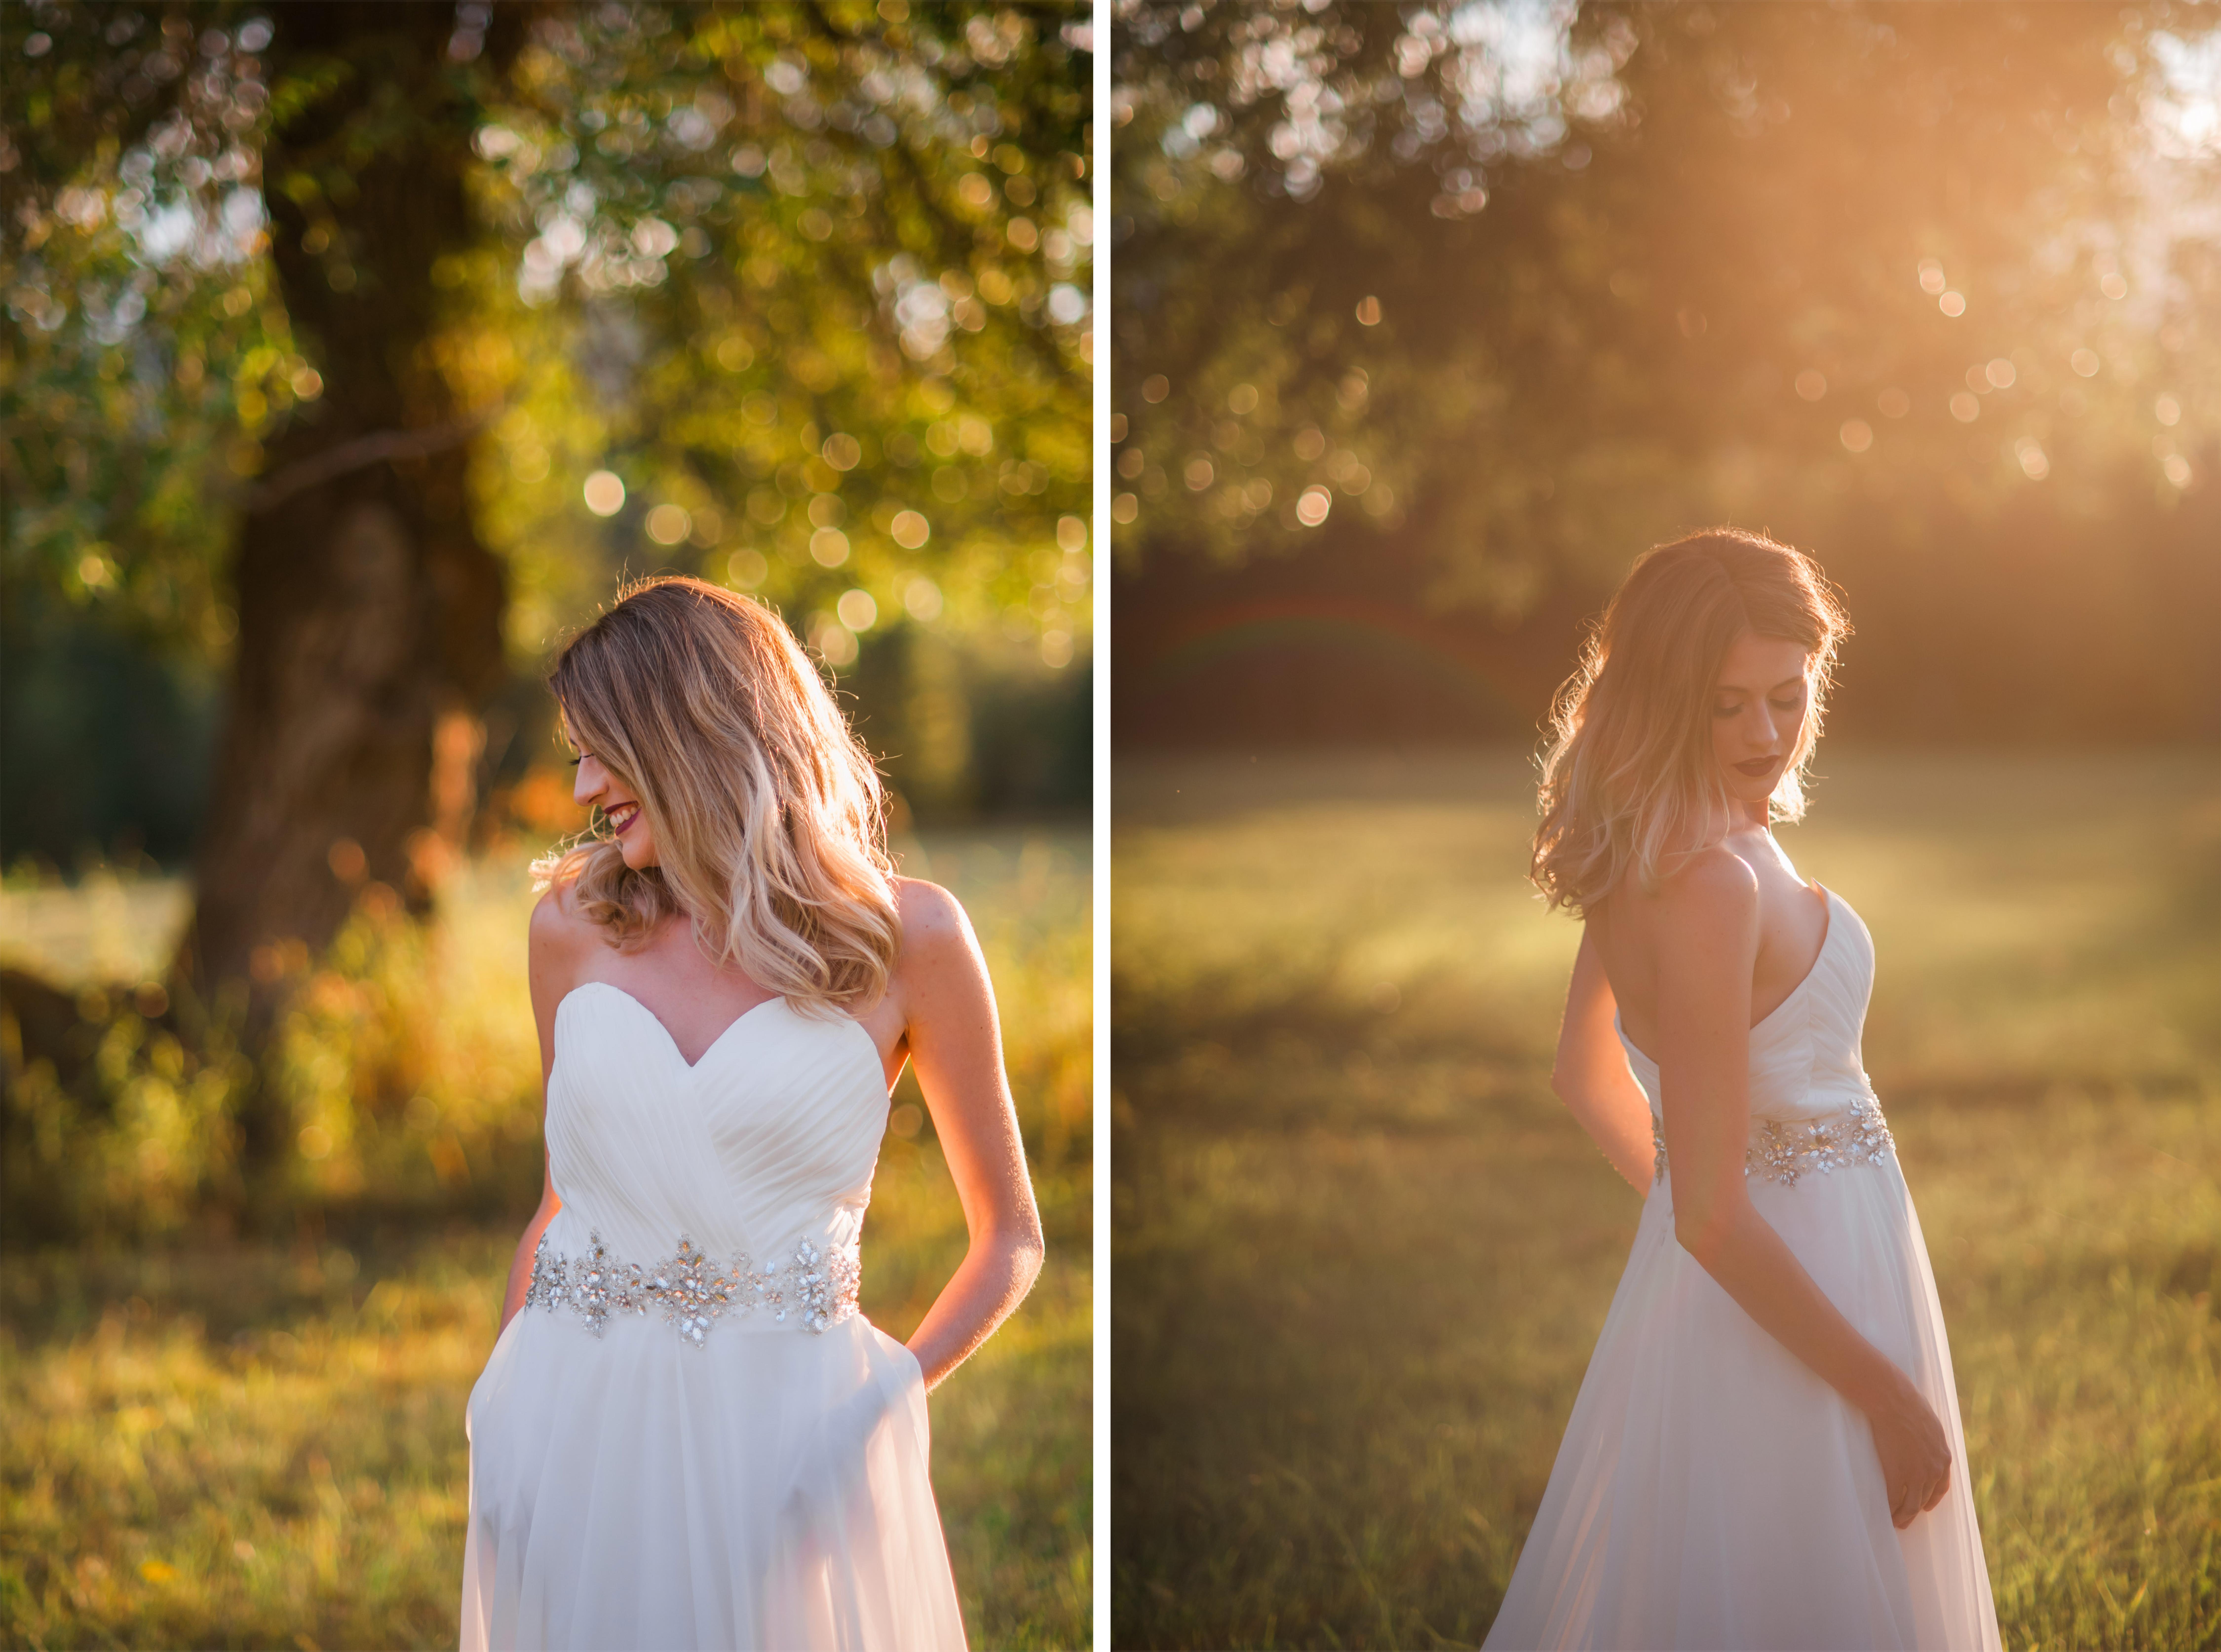 35-wedding-workshop-retreat-in-golden-bc-rhiannon-sarah-photography